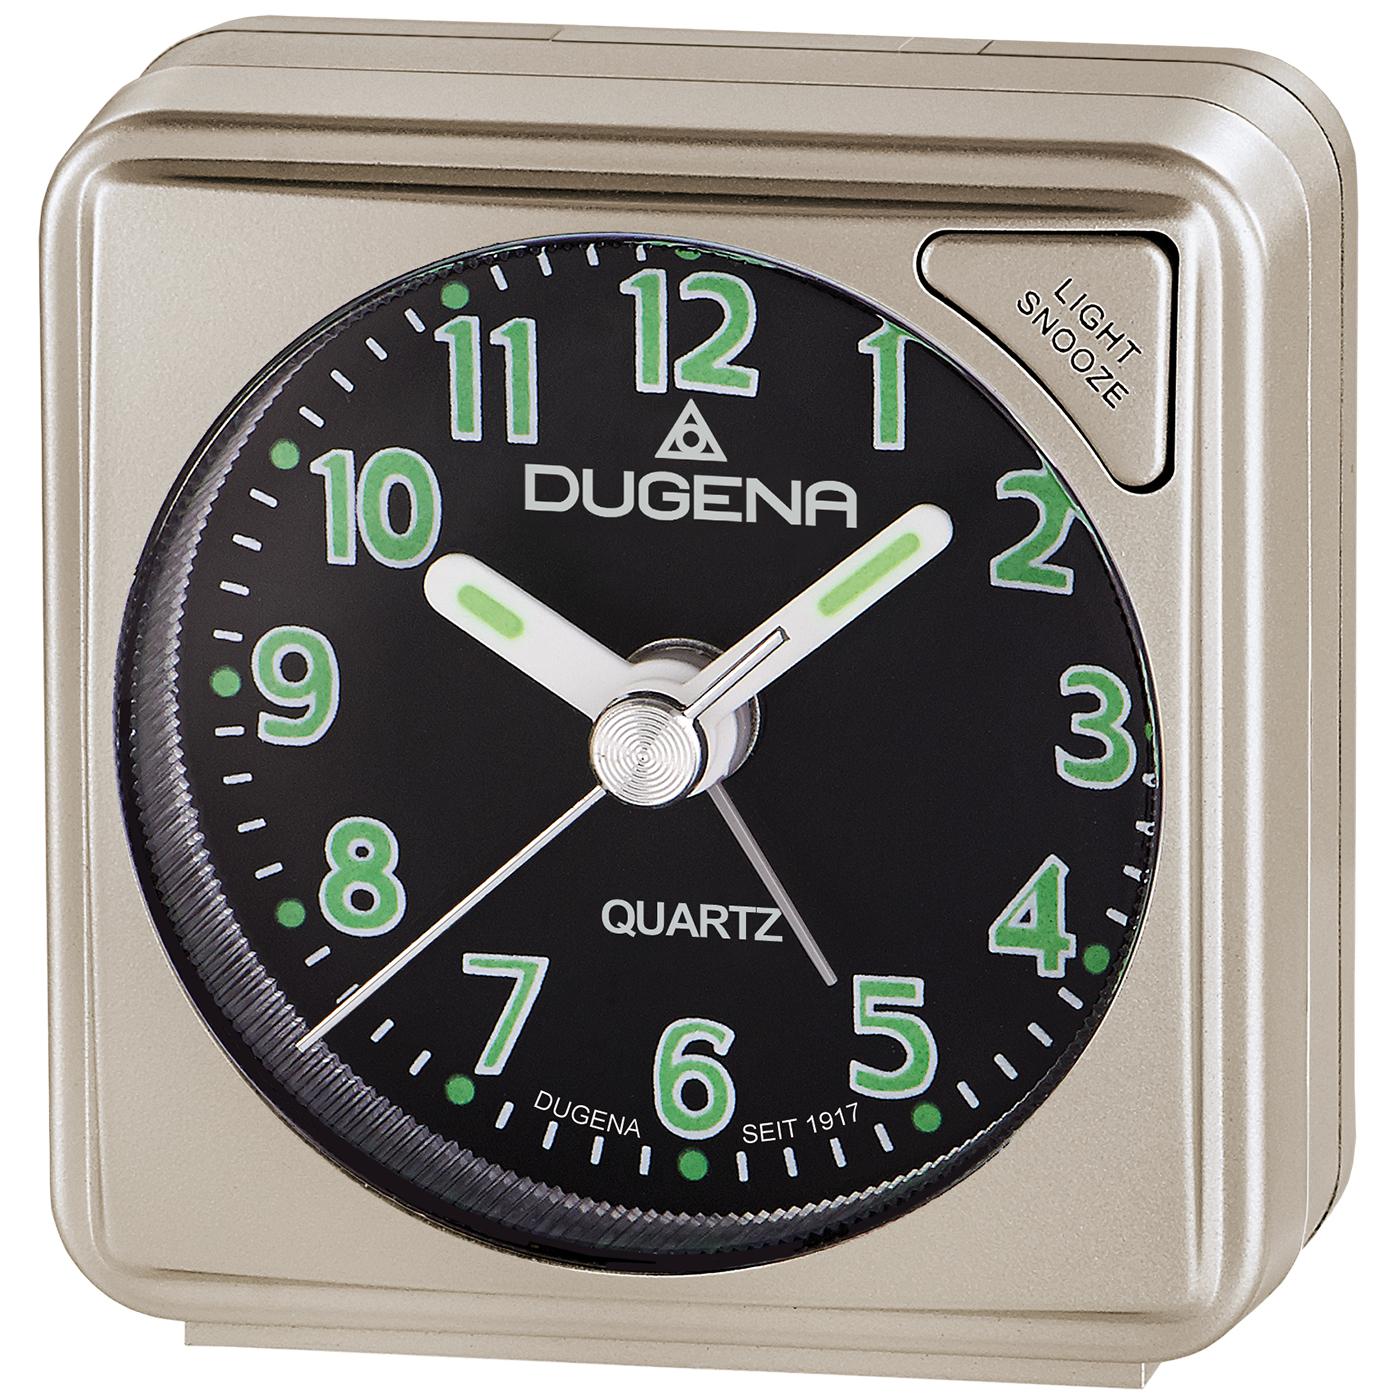 DUGENA Quarz-Reisewecker 4460614